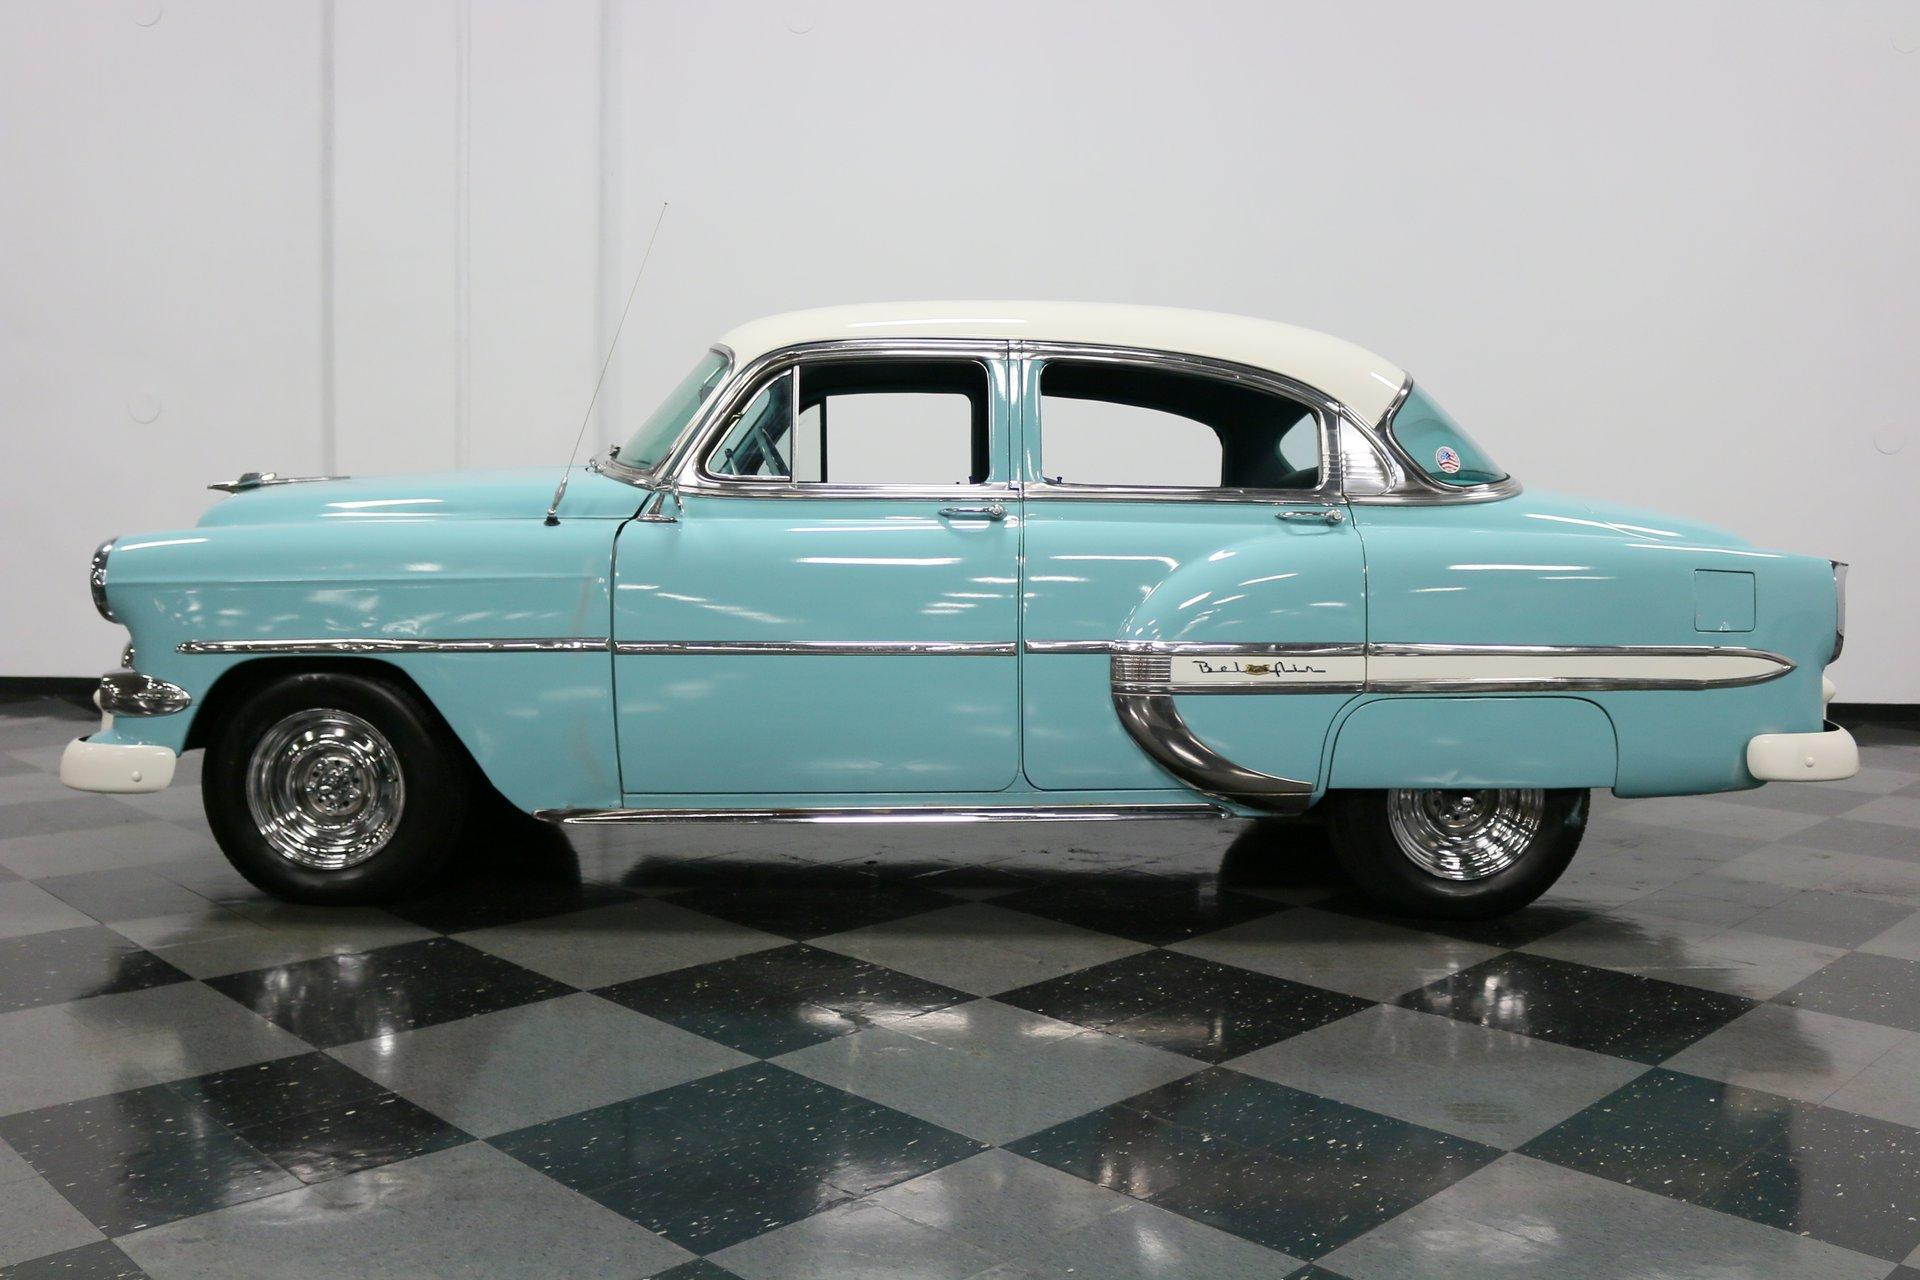 1954 chevrolet bel air 4 door sedan